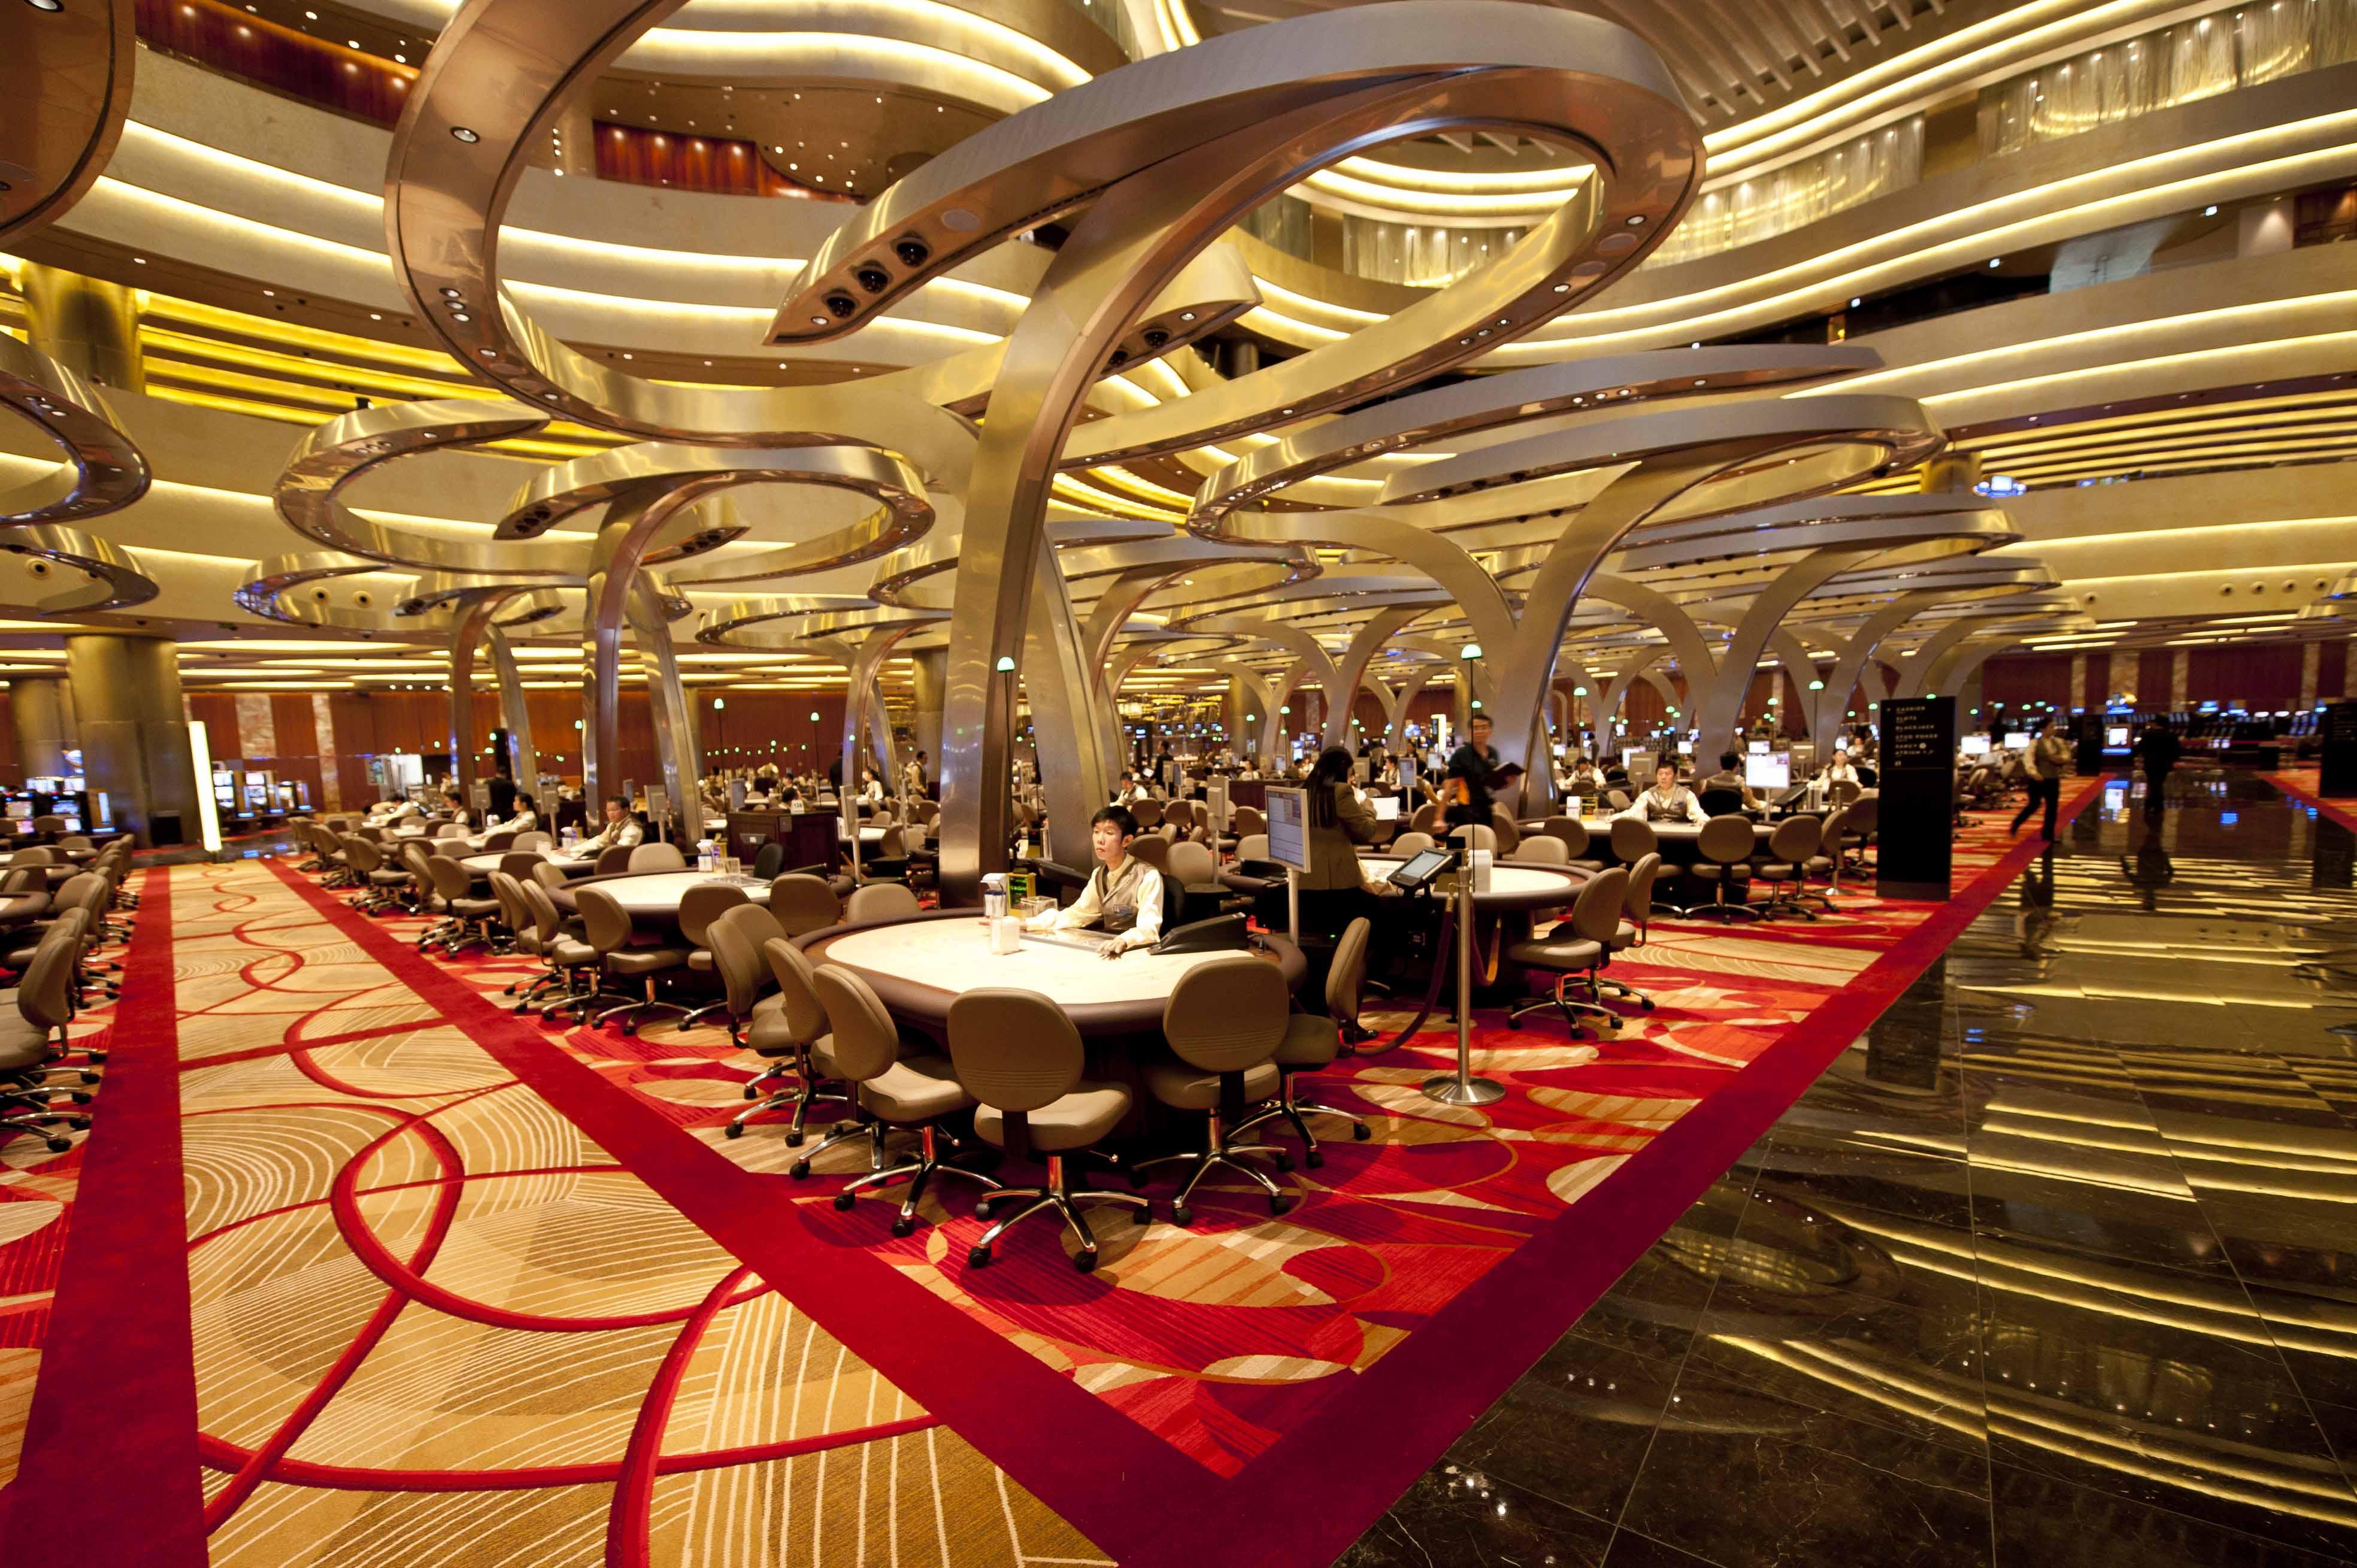 jackpot party casino hack.rar download